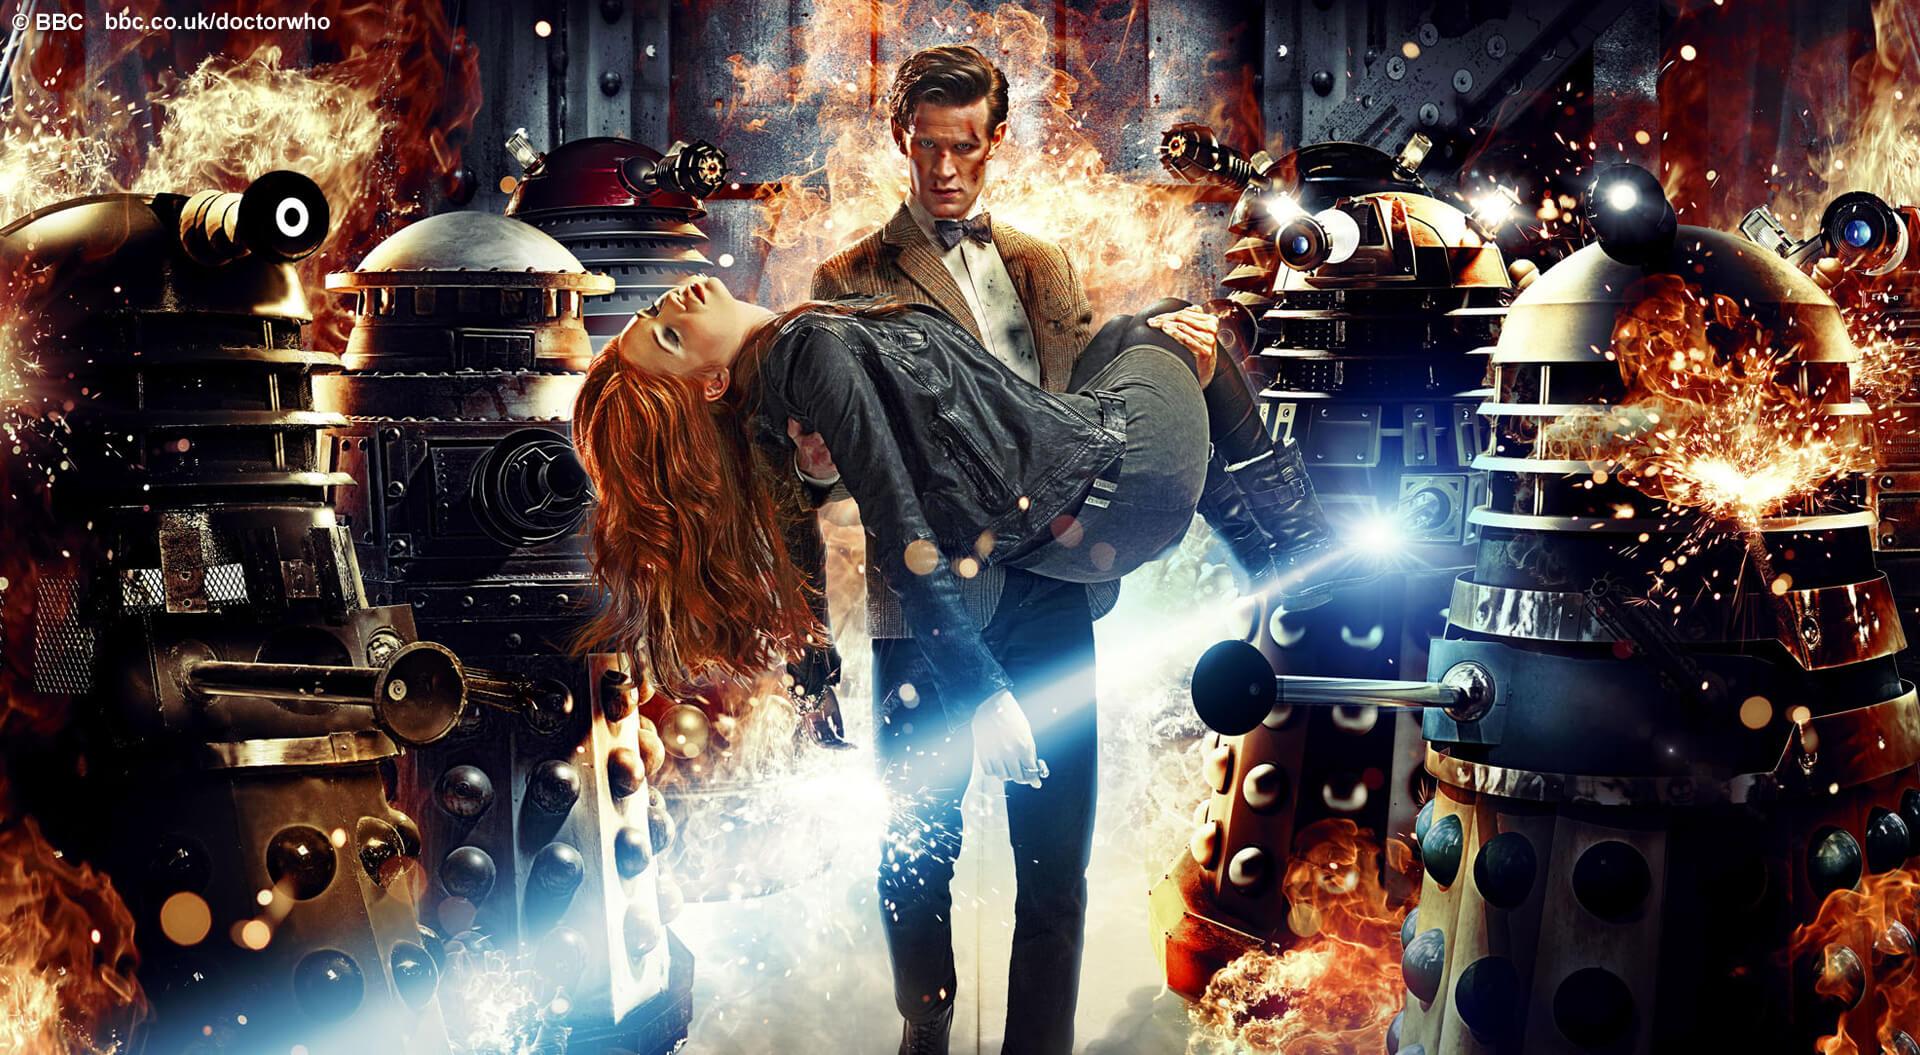 Doctor-Who-Season-7.jpg